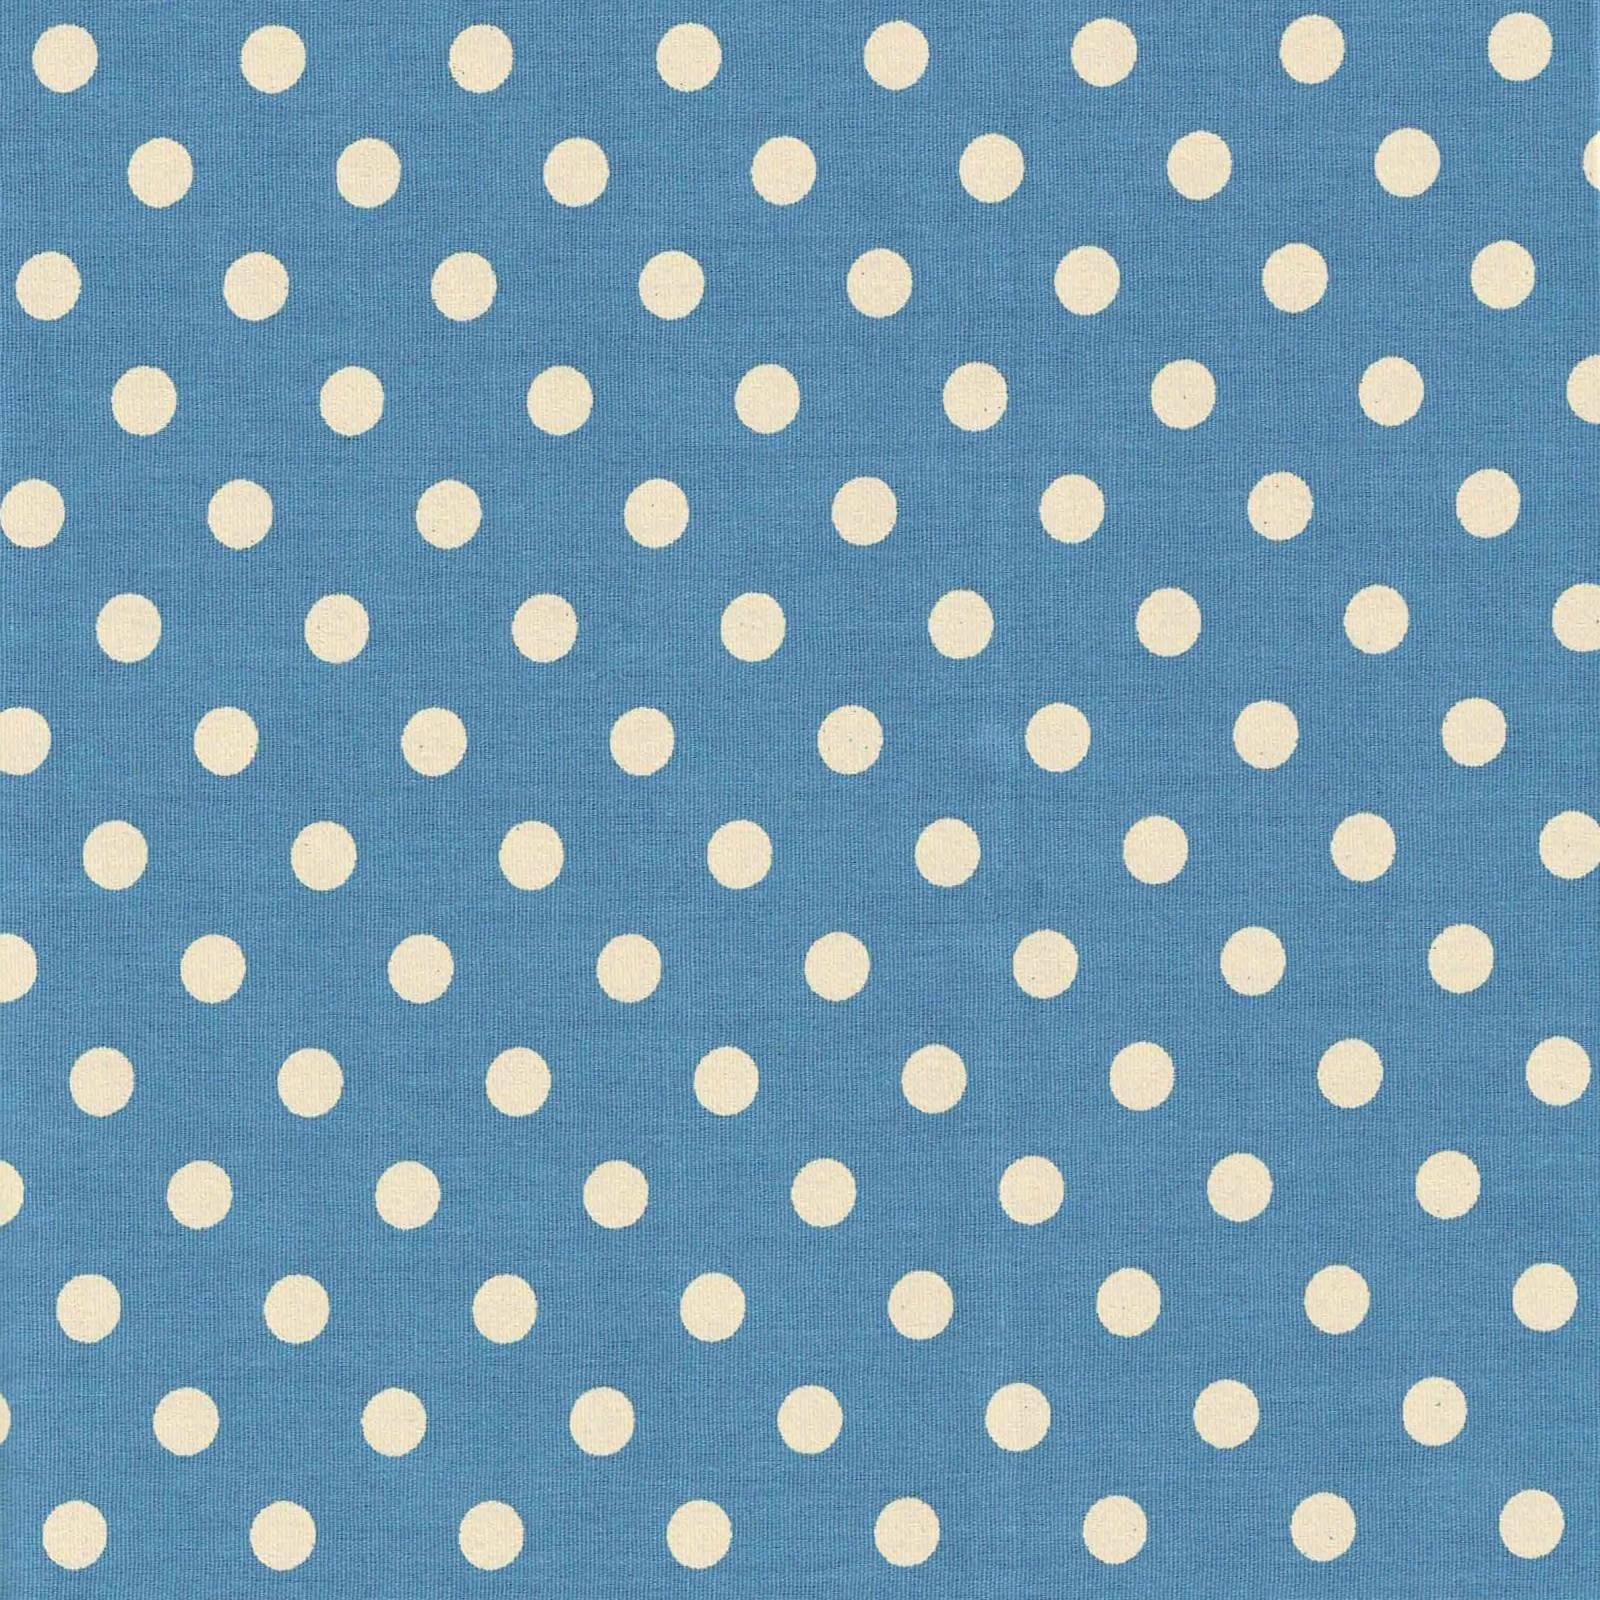 Poá Grande Azul Jeans Com Bege Ref.1554 cor 131 Peripan - Armarinhos Nodari